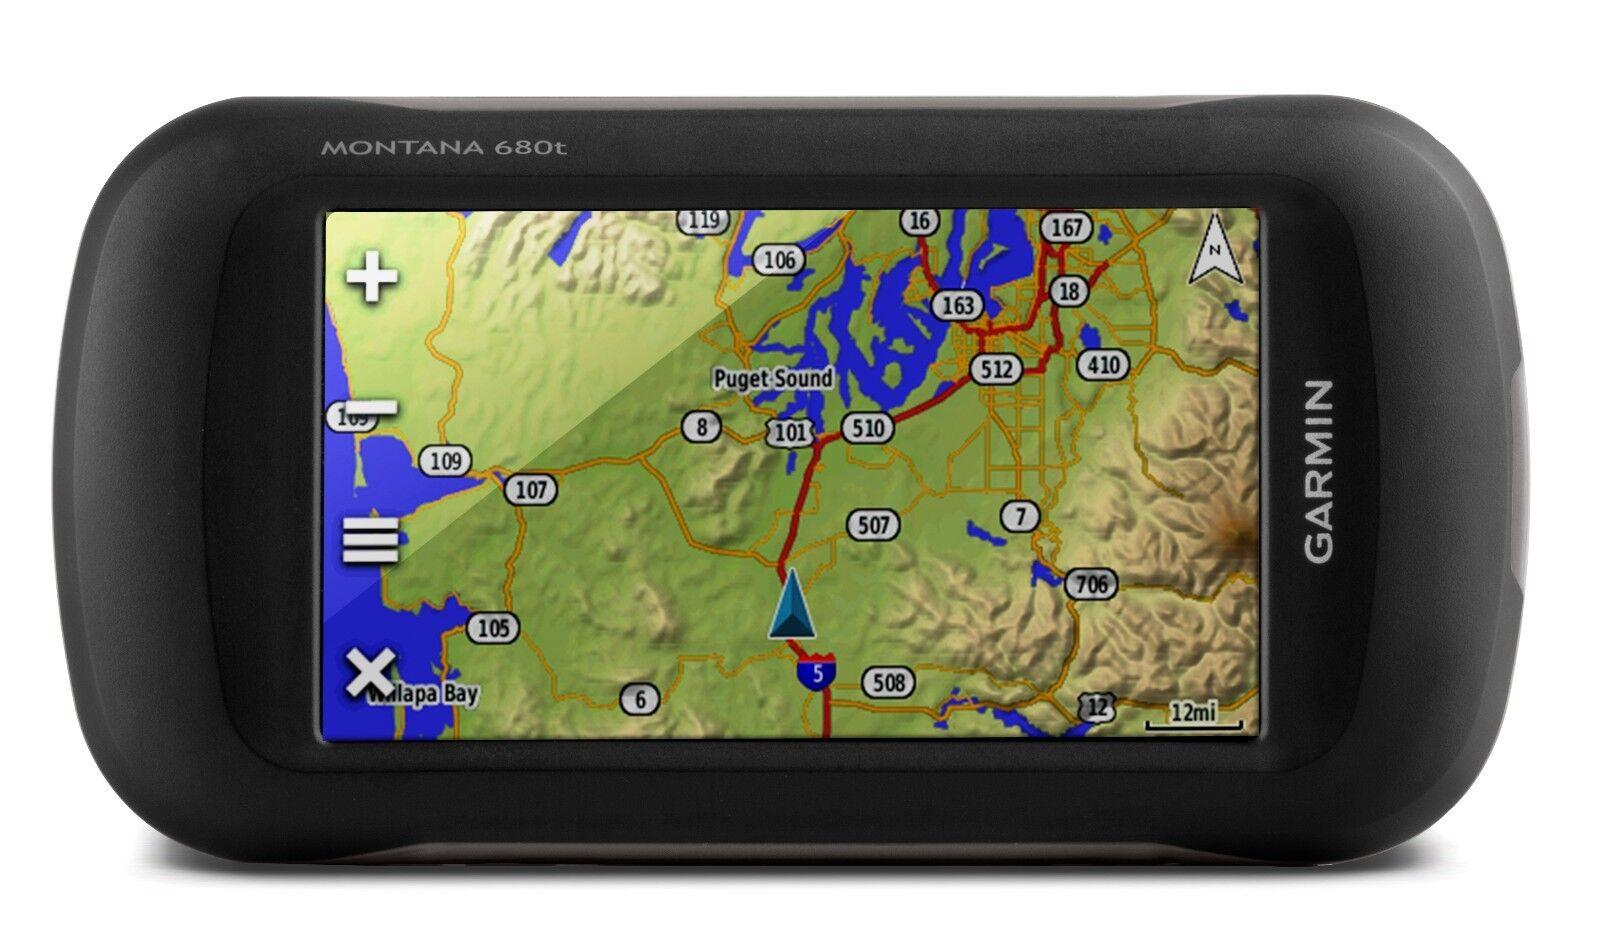 Garmin Montana 680t GPS GLONASS Handheld w/ 8 mp Camera TOPO